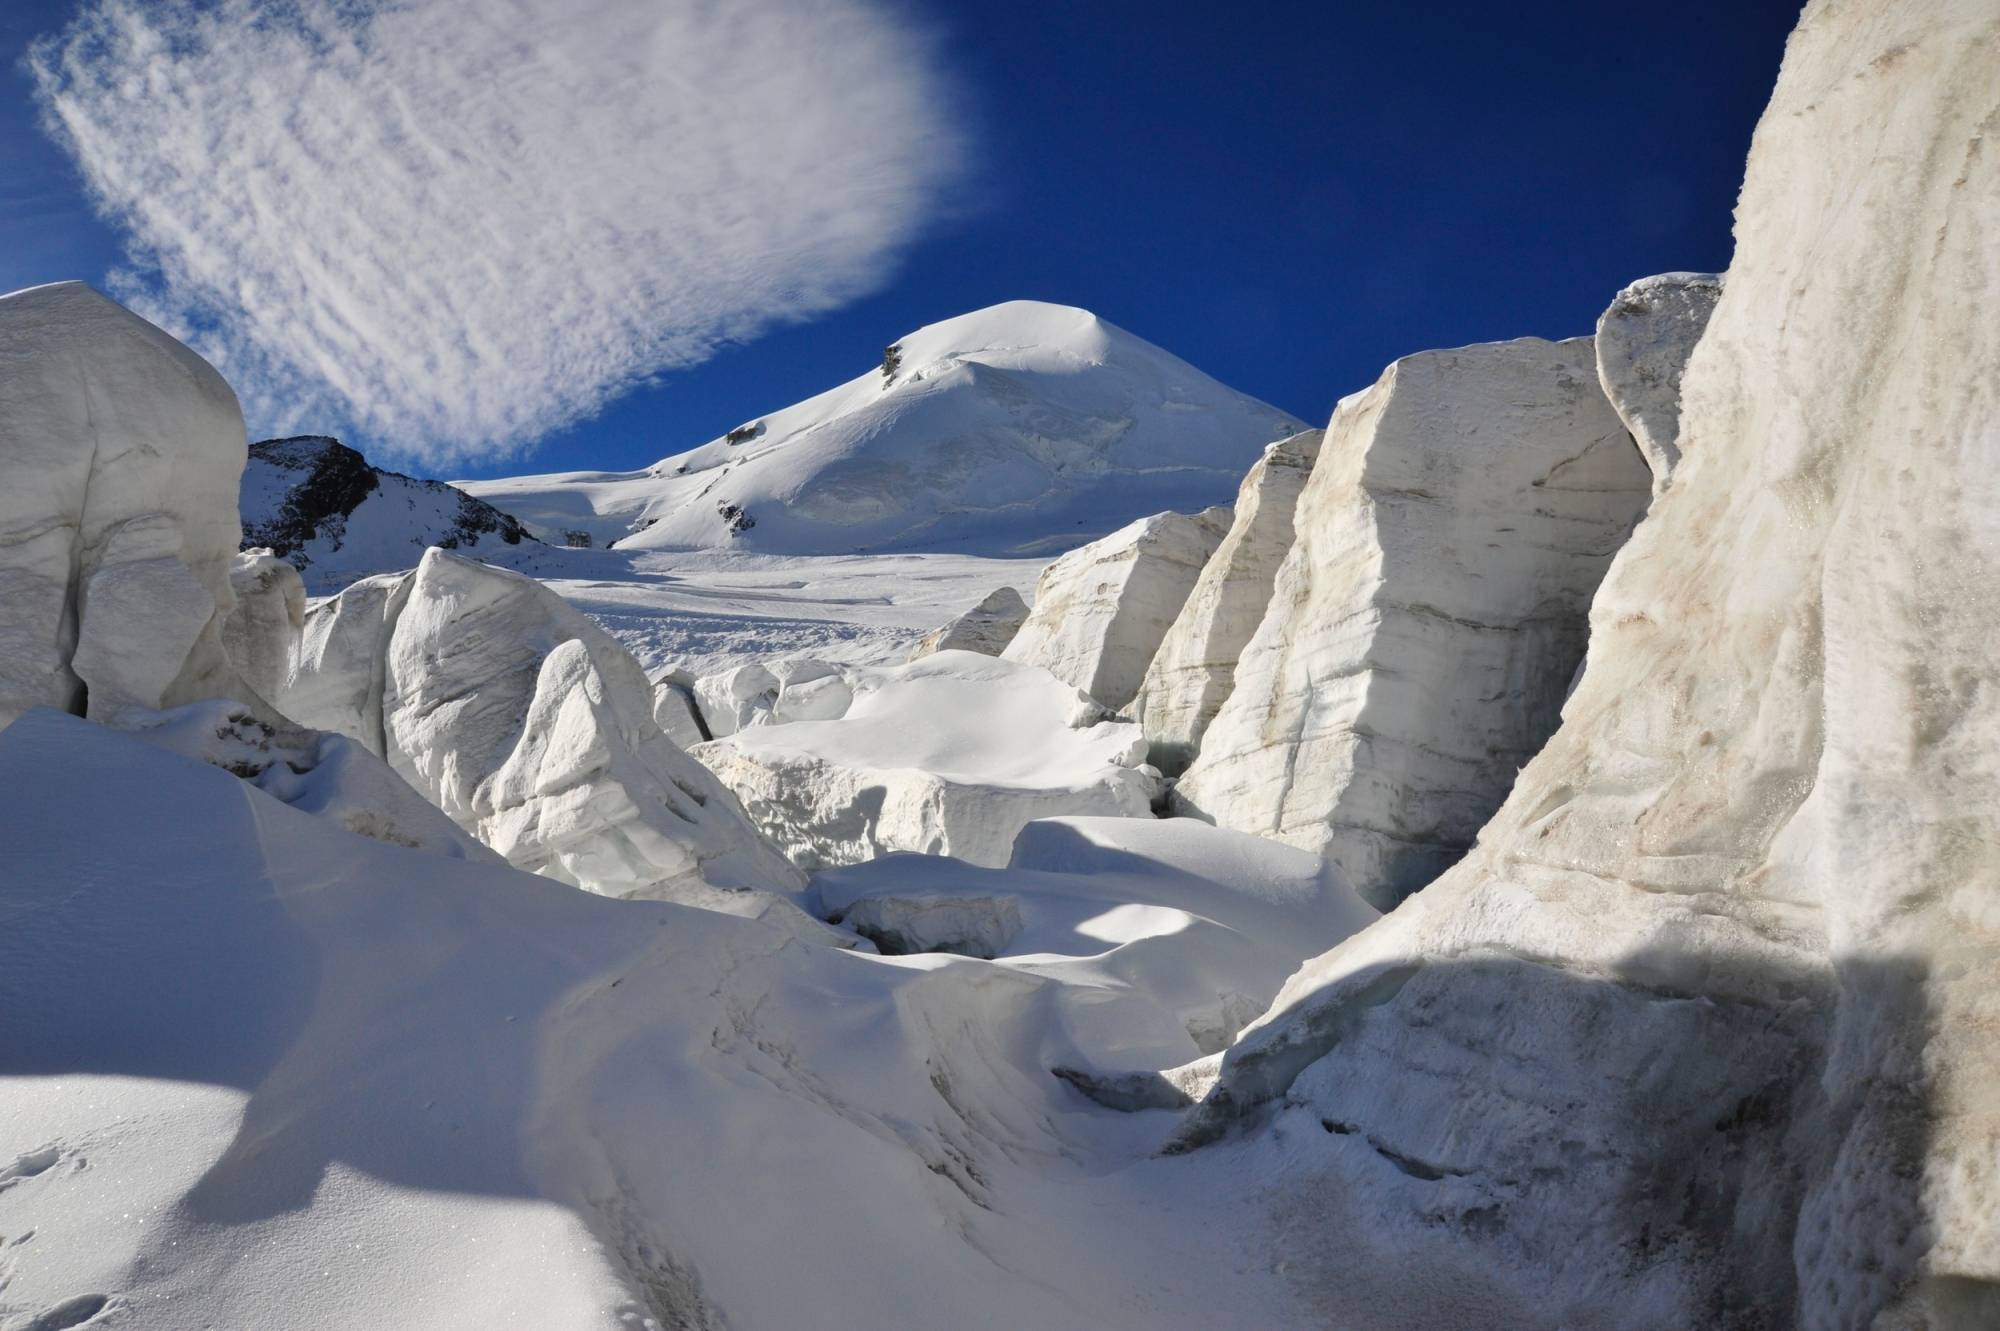 Klettergurt Skitour : Allalinhorn 4027m skitour saas fee guides